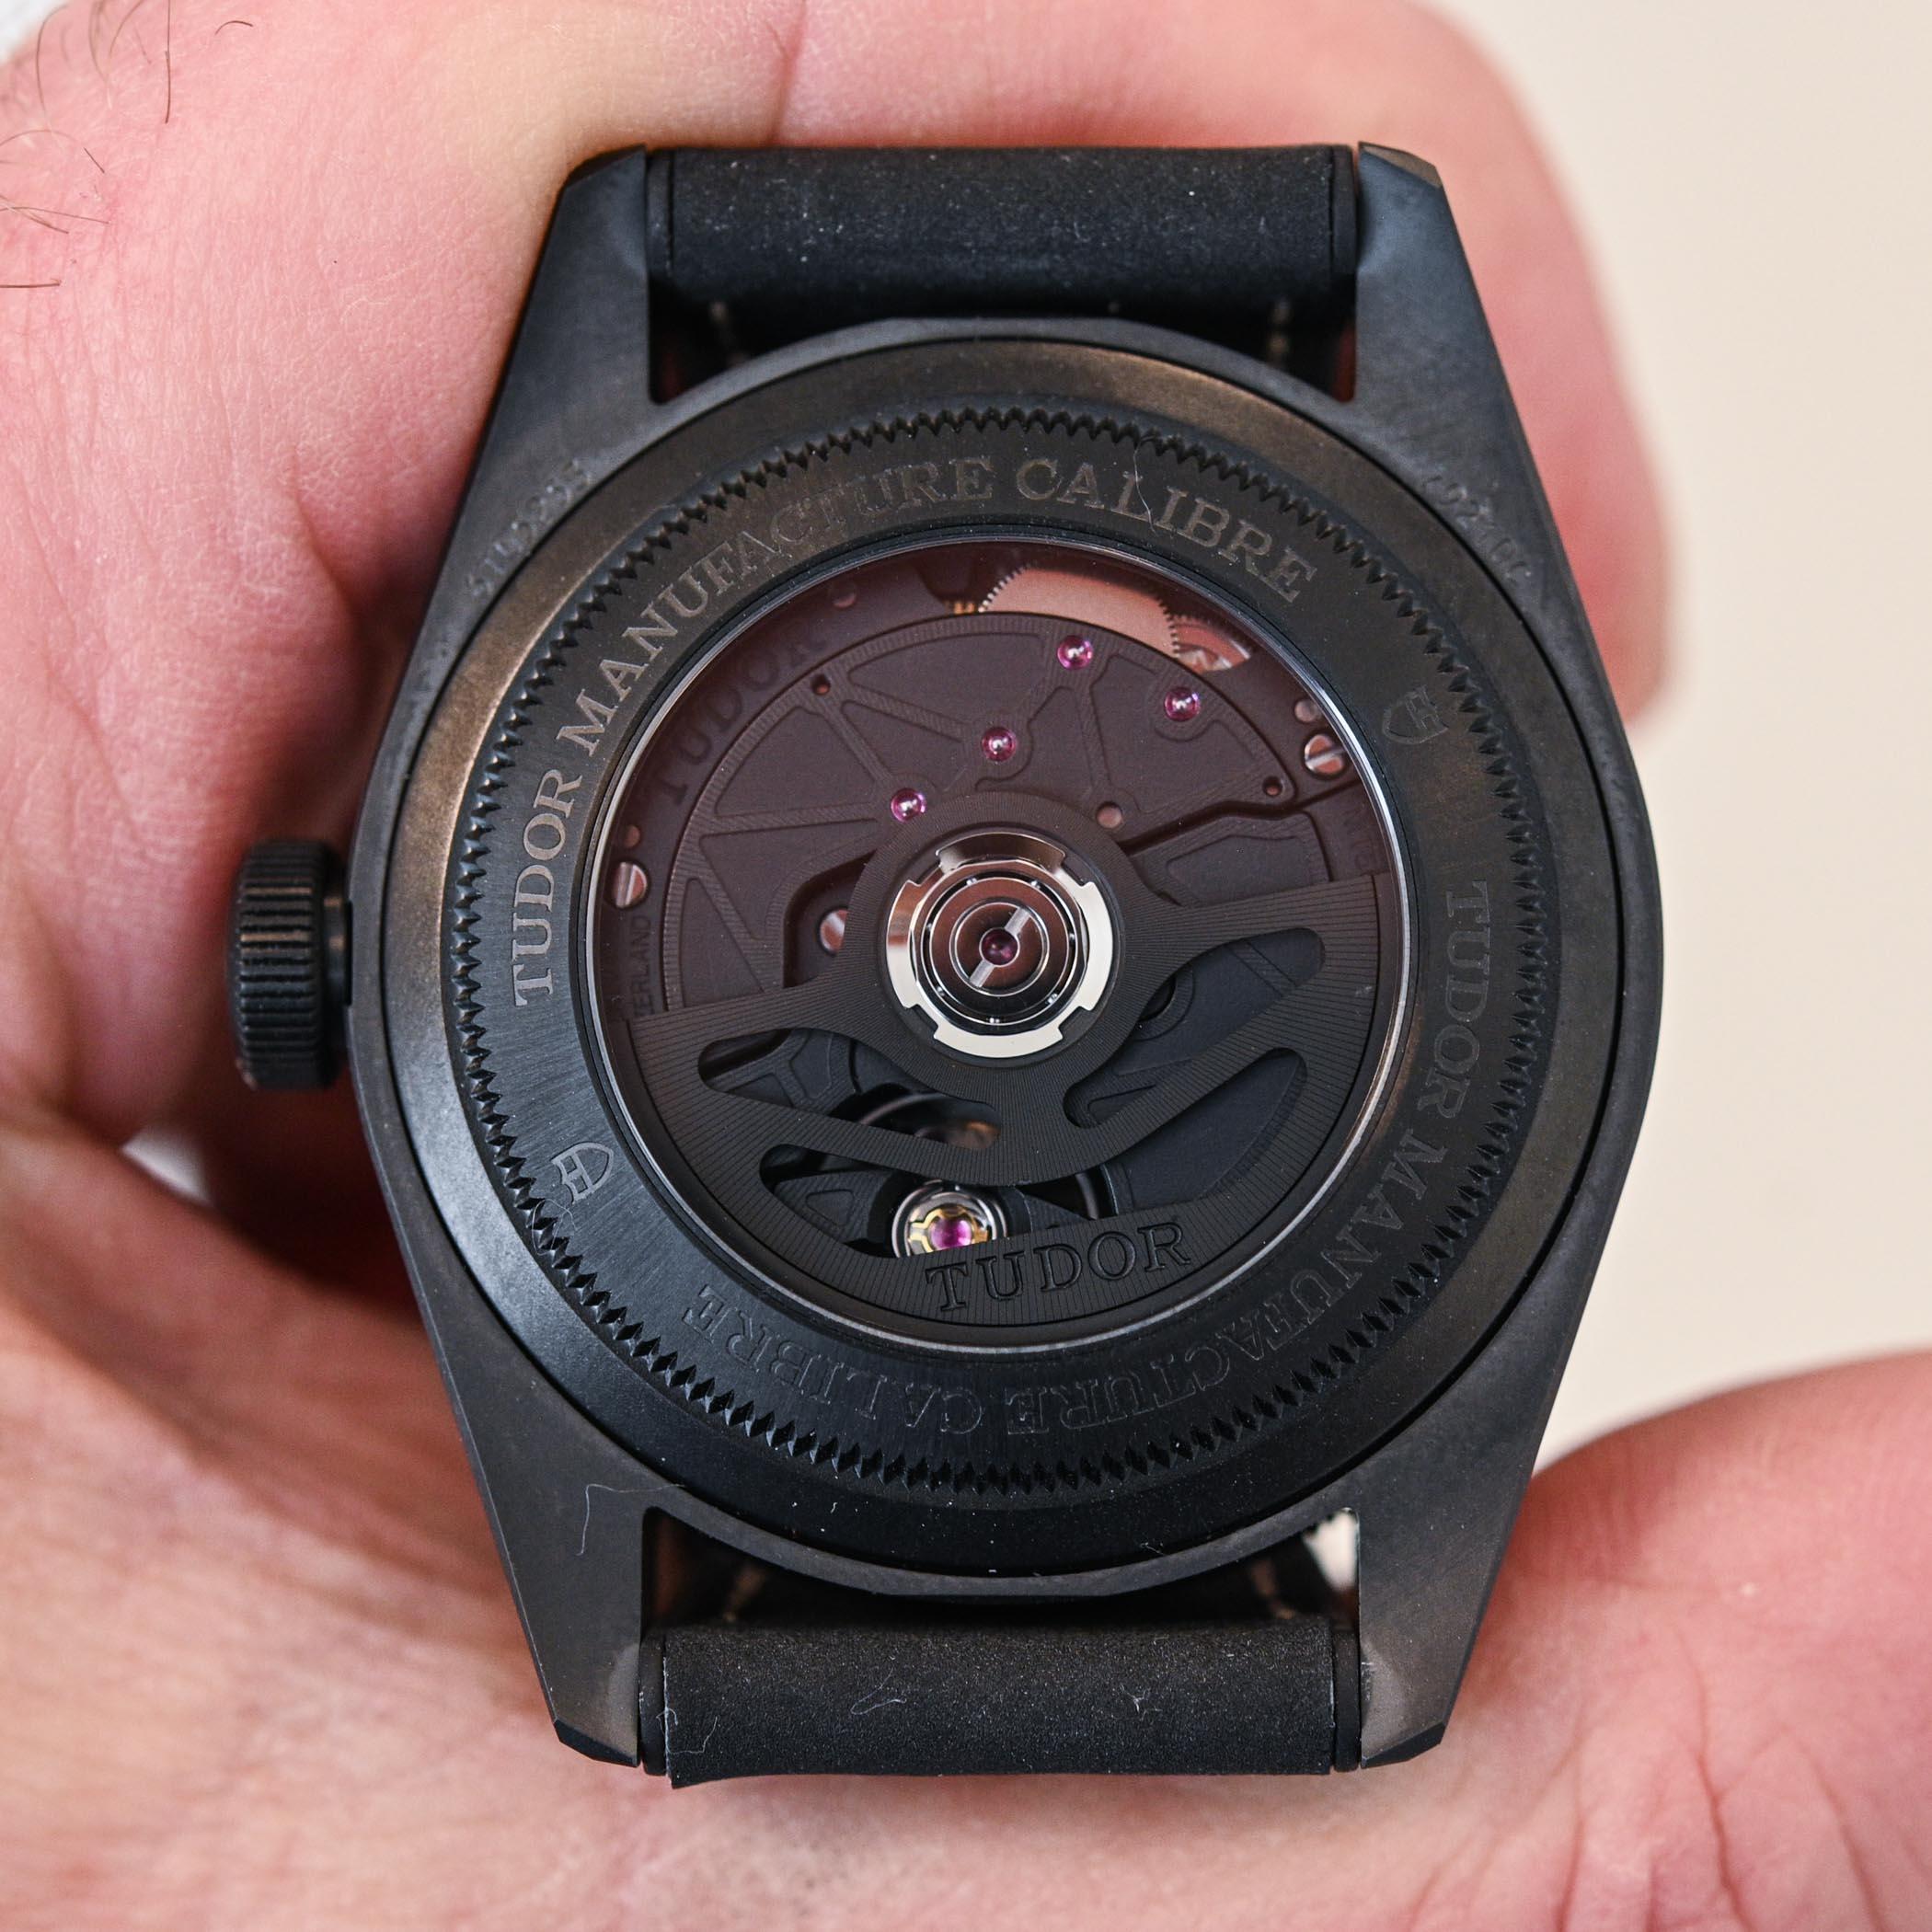 Tudor Black Bay Ceramic Master Chronometer METAS M79210CNU-0001 - review - 5